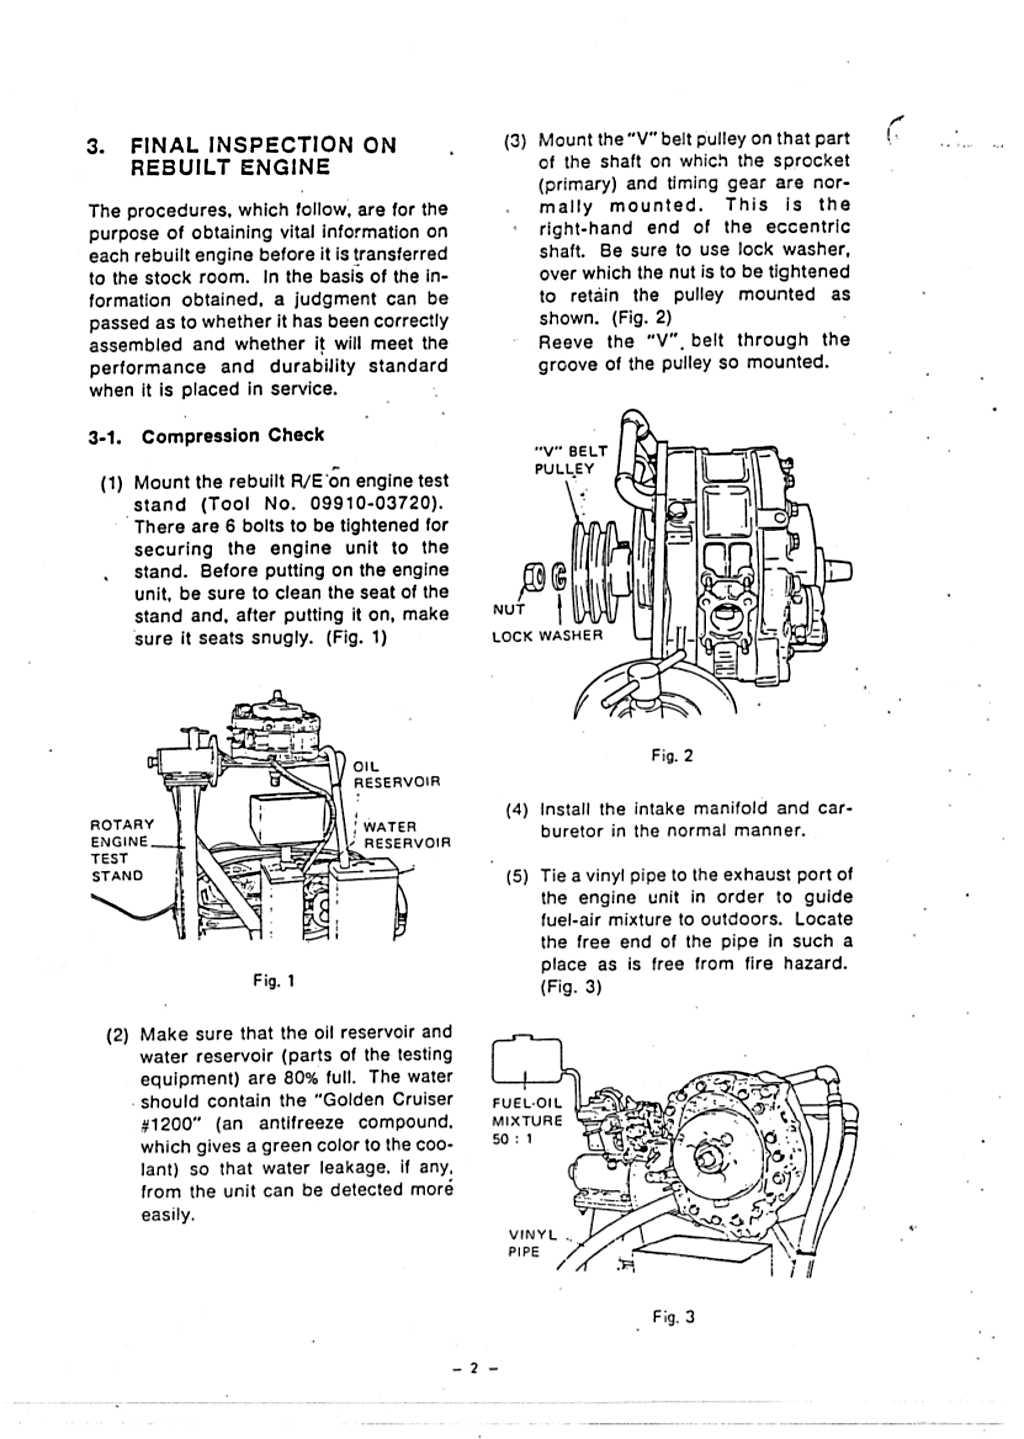 Manual B7500 Kubota Ebook Robin Subaru Ec12 Fuel Lubricant Float Carburetor Type Parts Diagram Array Beko Ca5411ffs Rh Pureroseoil Us